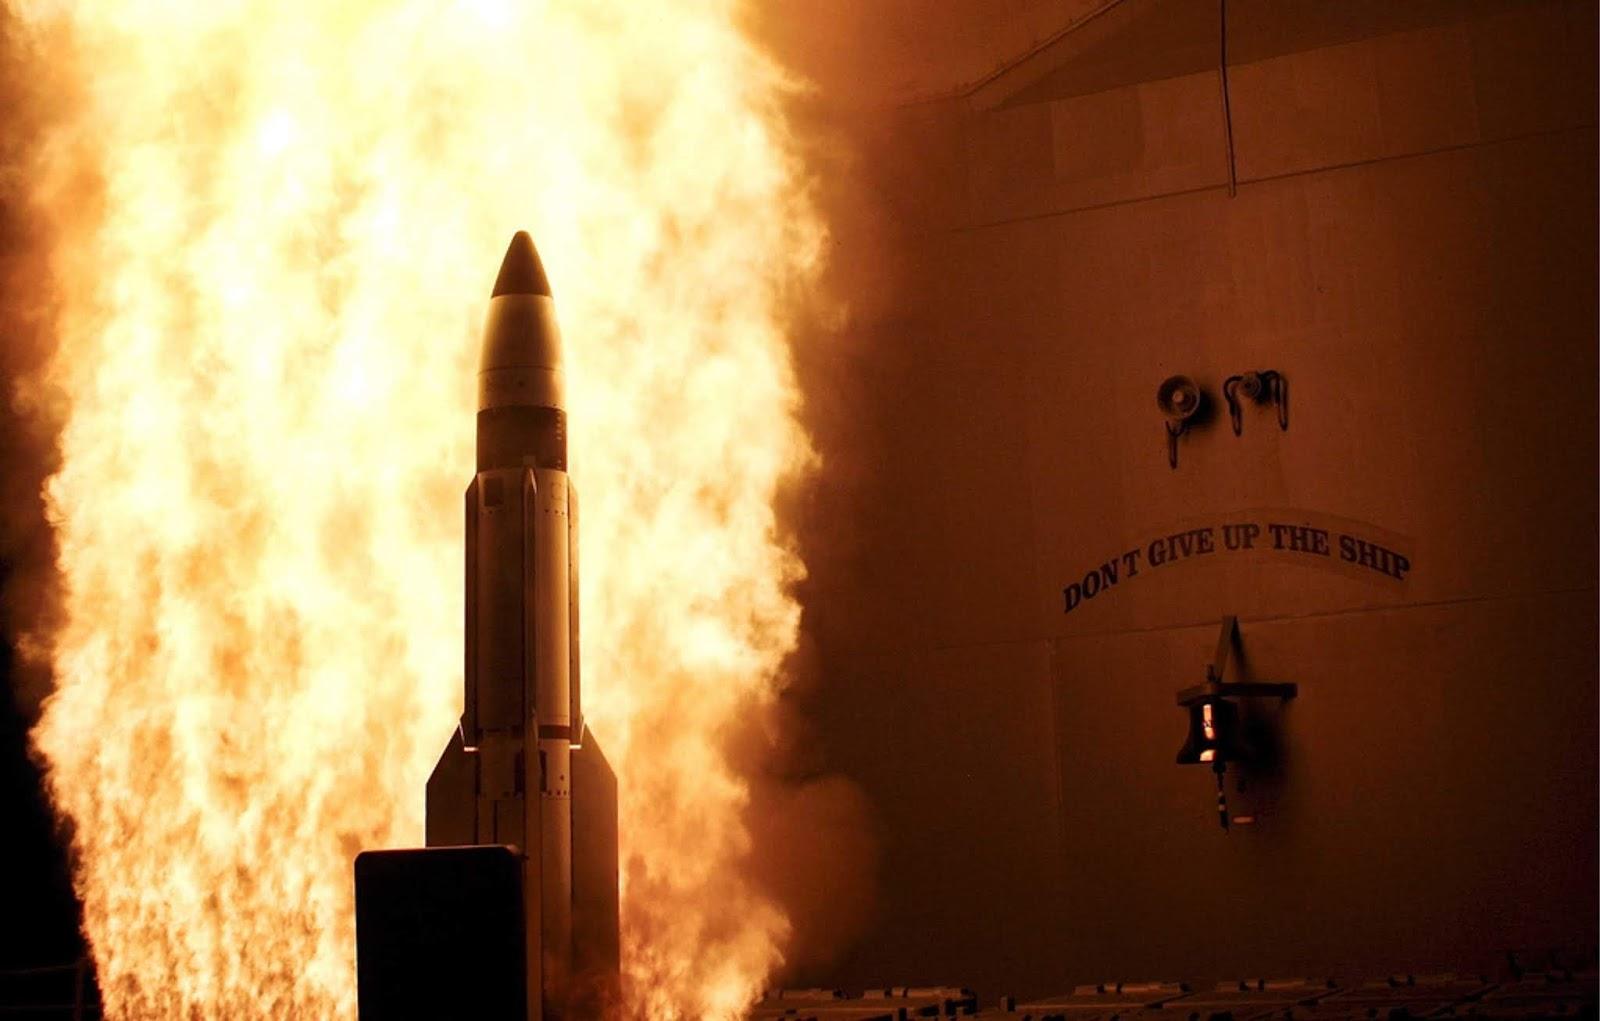 Amerika Serikat telah menyetujui penjualan anti-rudal baru SM-3 Block IIA Jepang